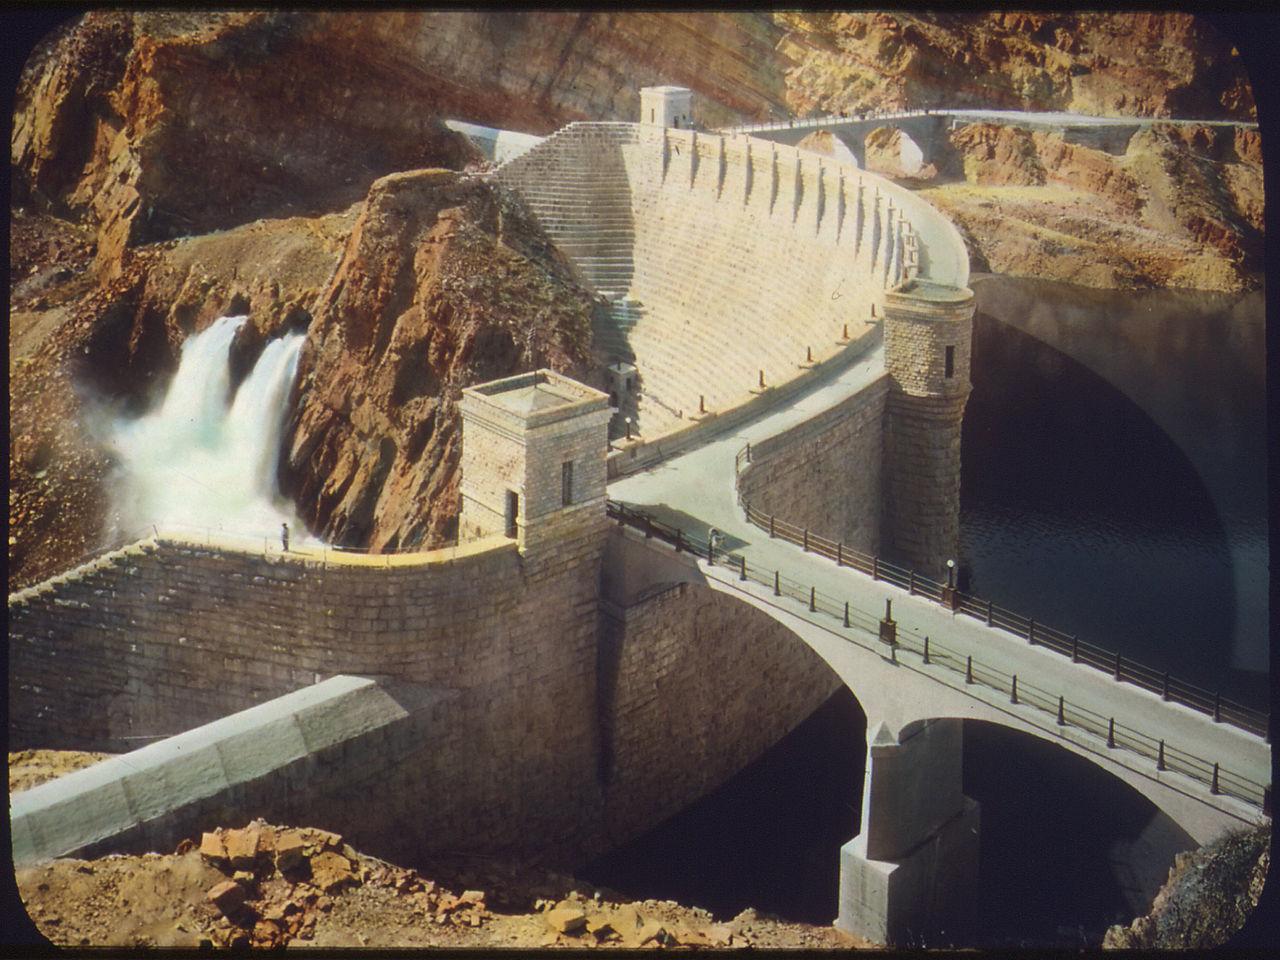 File:Salt River Project - Roosevelt Dam - Arizona - NARA - 294694